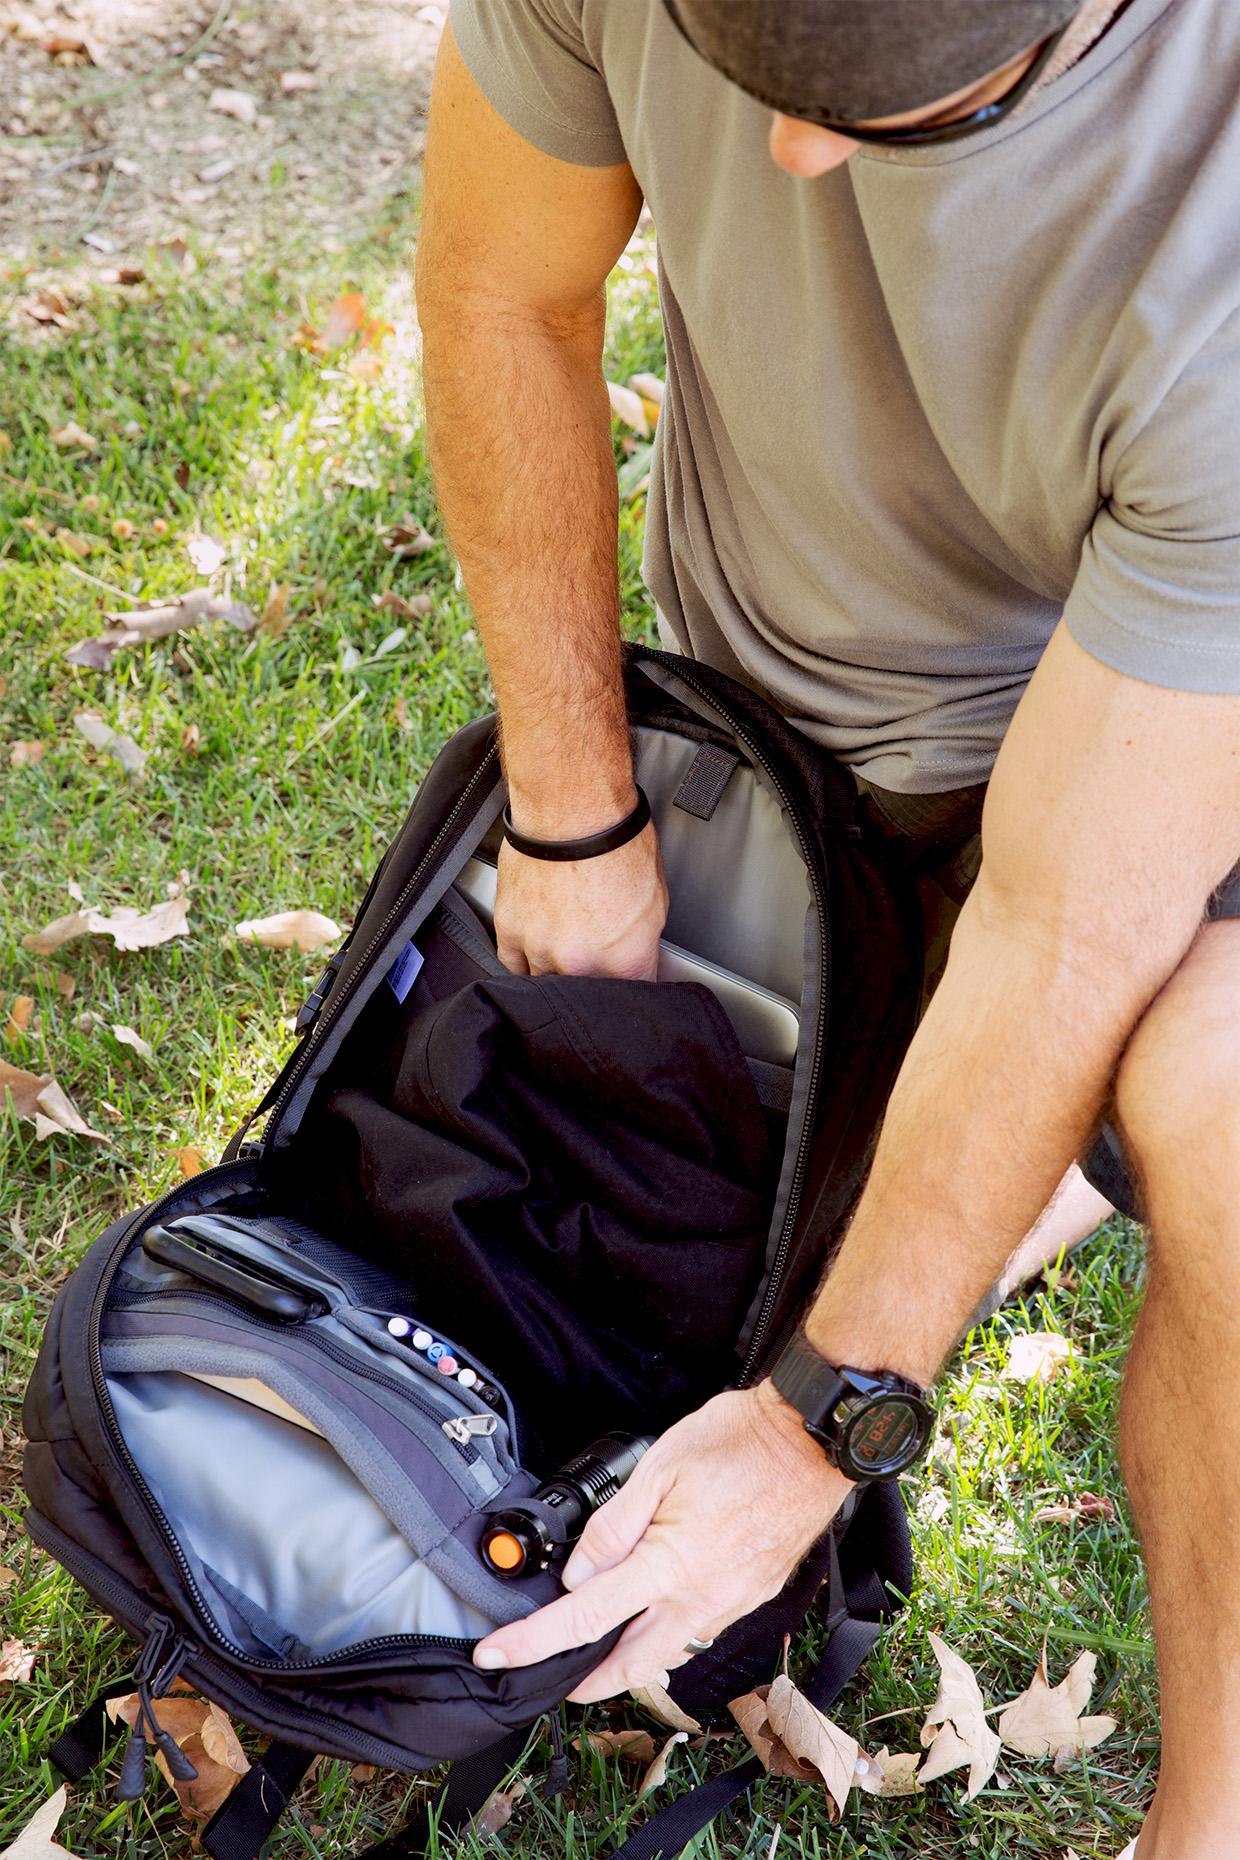 Matt Computer in Back Pack